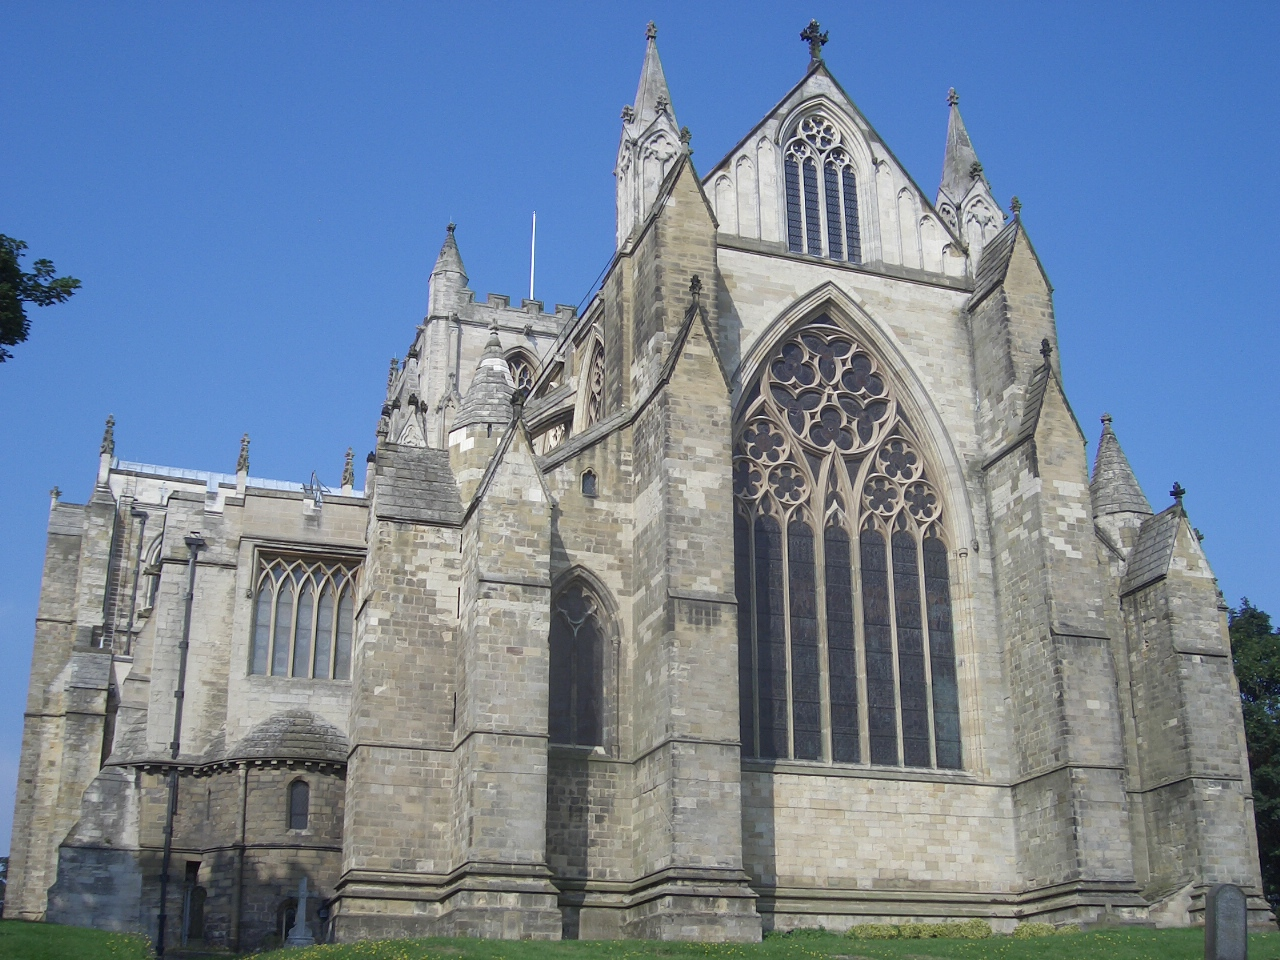 FileRipon Cathedral 2